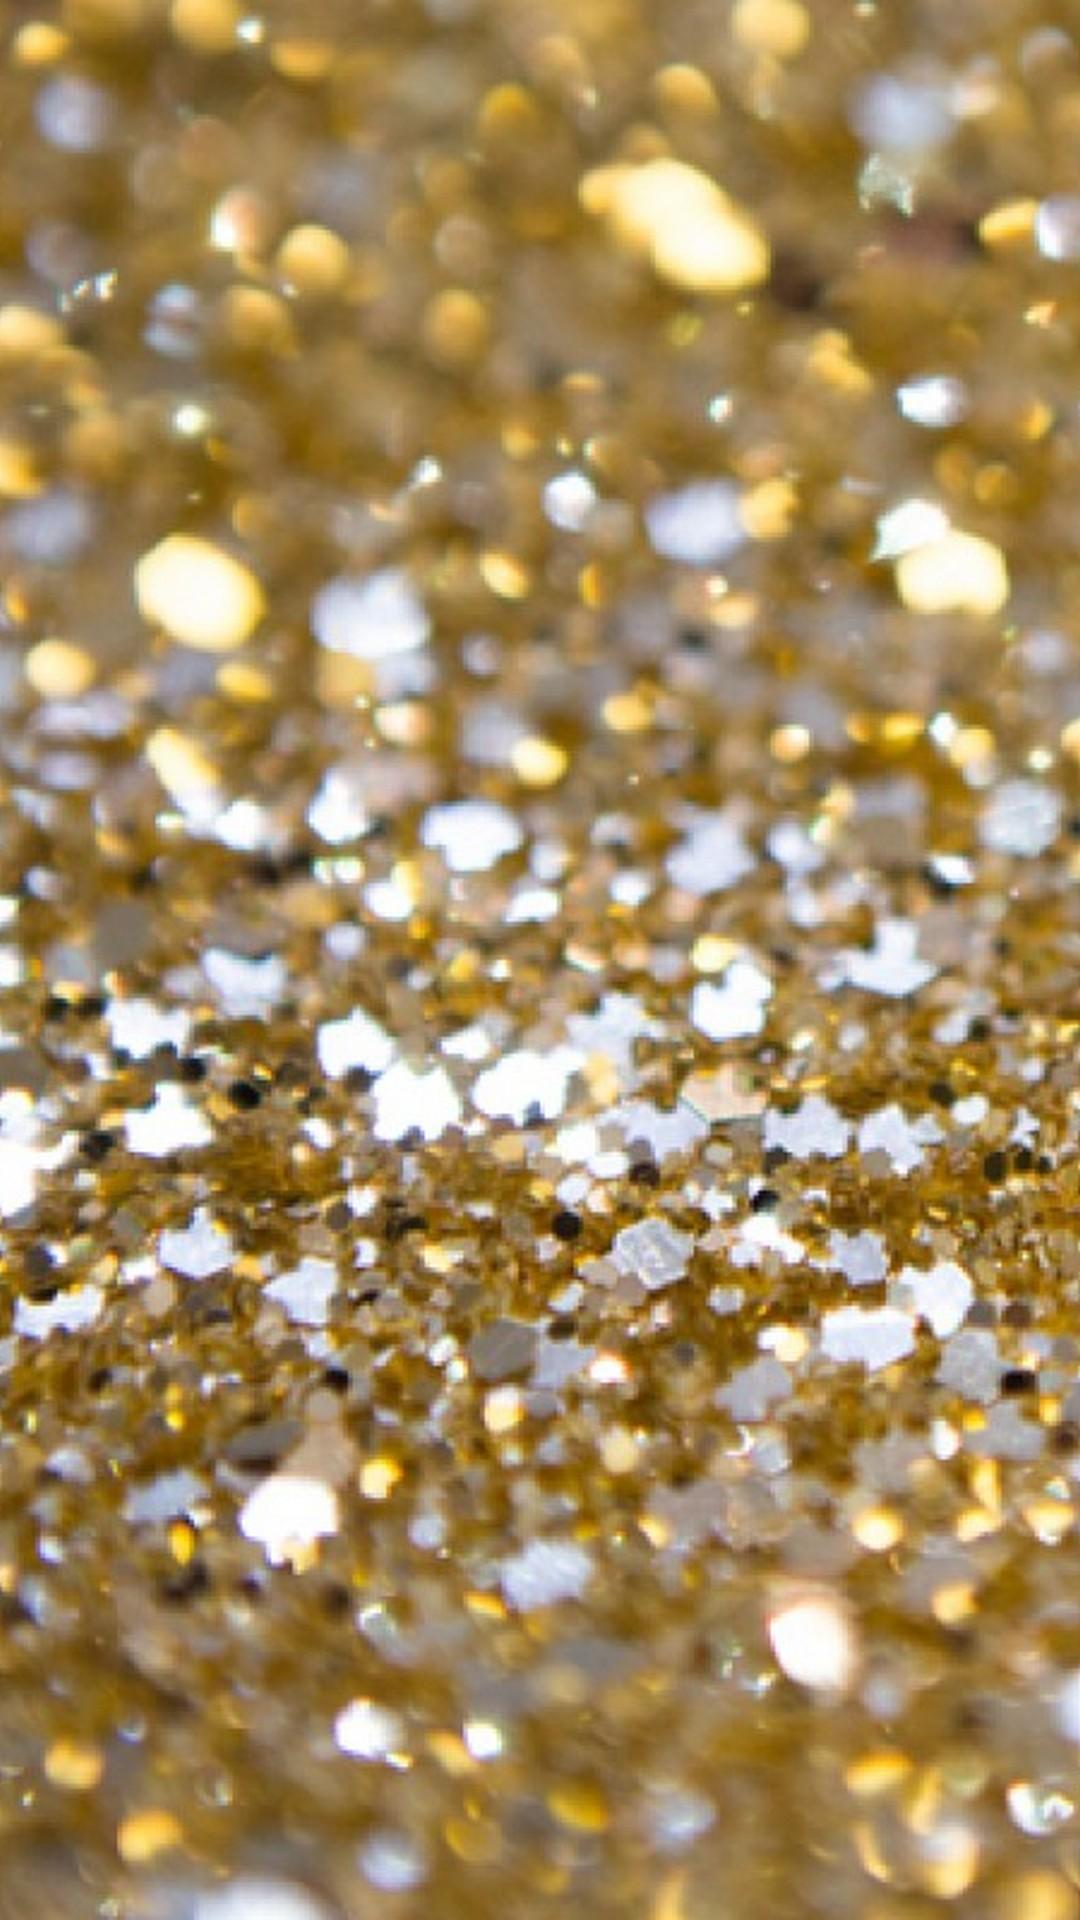 1920x1080 Gold Glitter Wallpaper For Computer Hd Iphone Gold